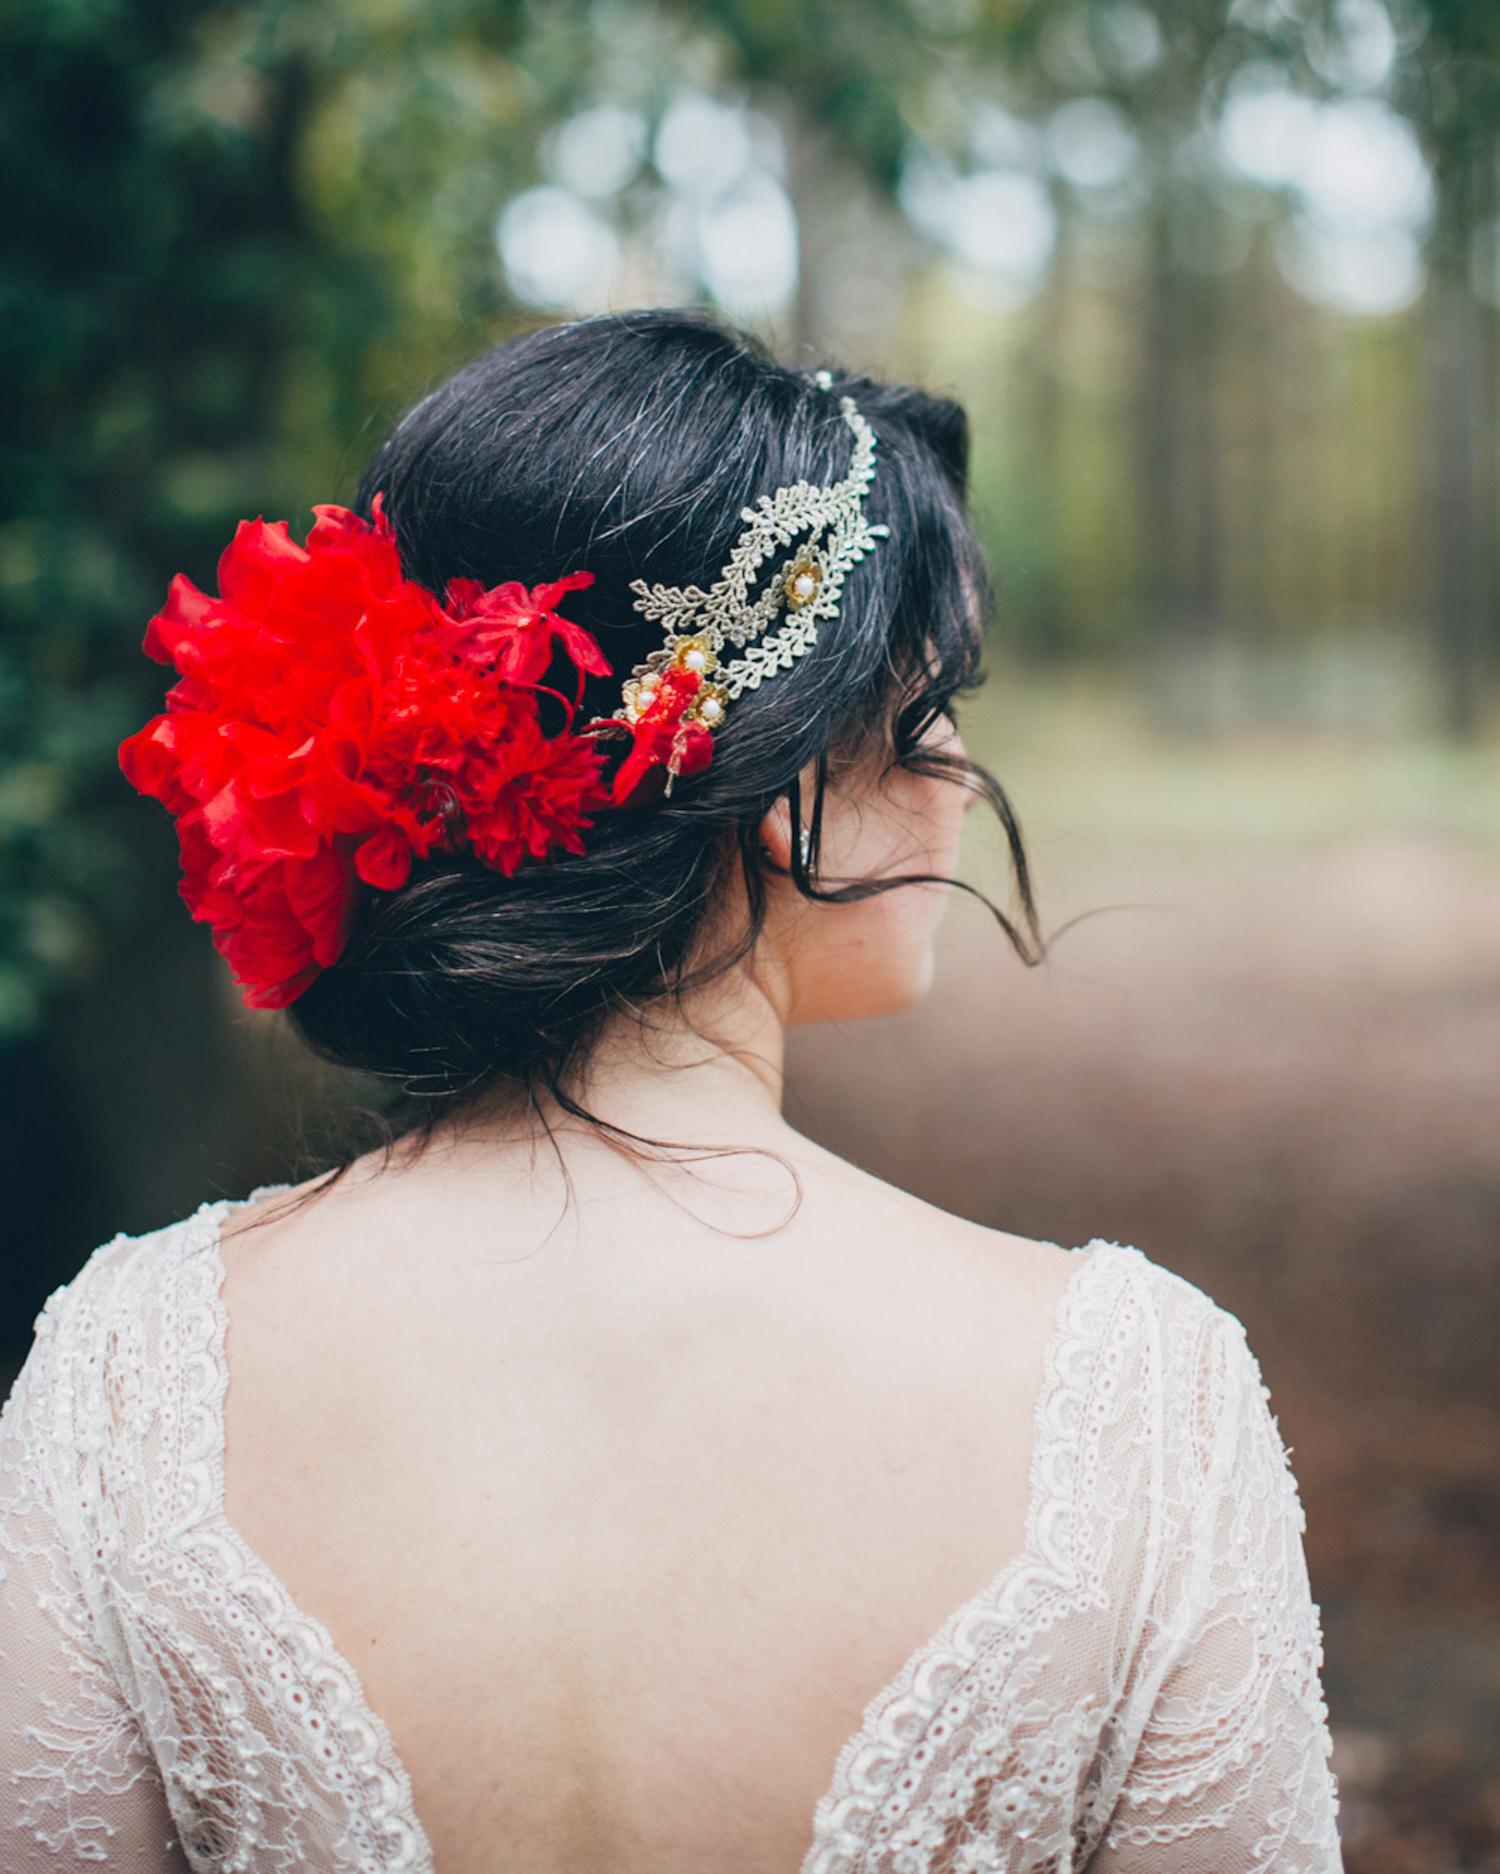 thea-rachit-wedding-updo-0257-s112016-0715.jpg